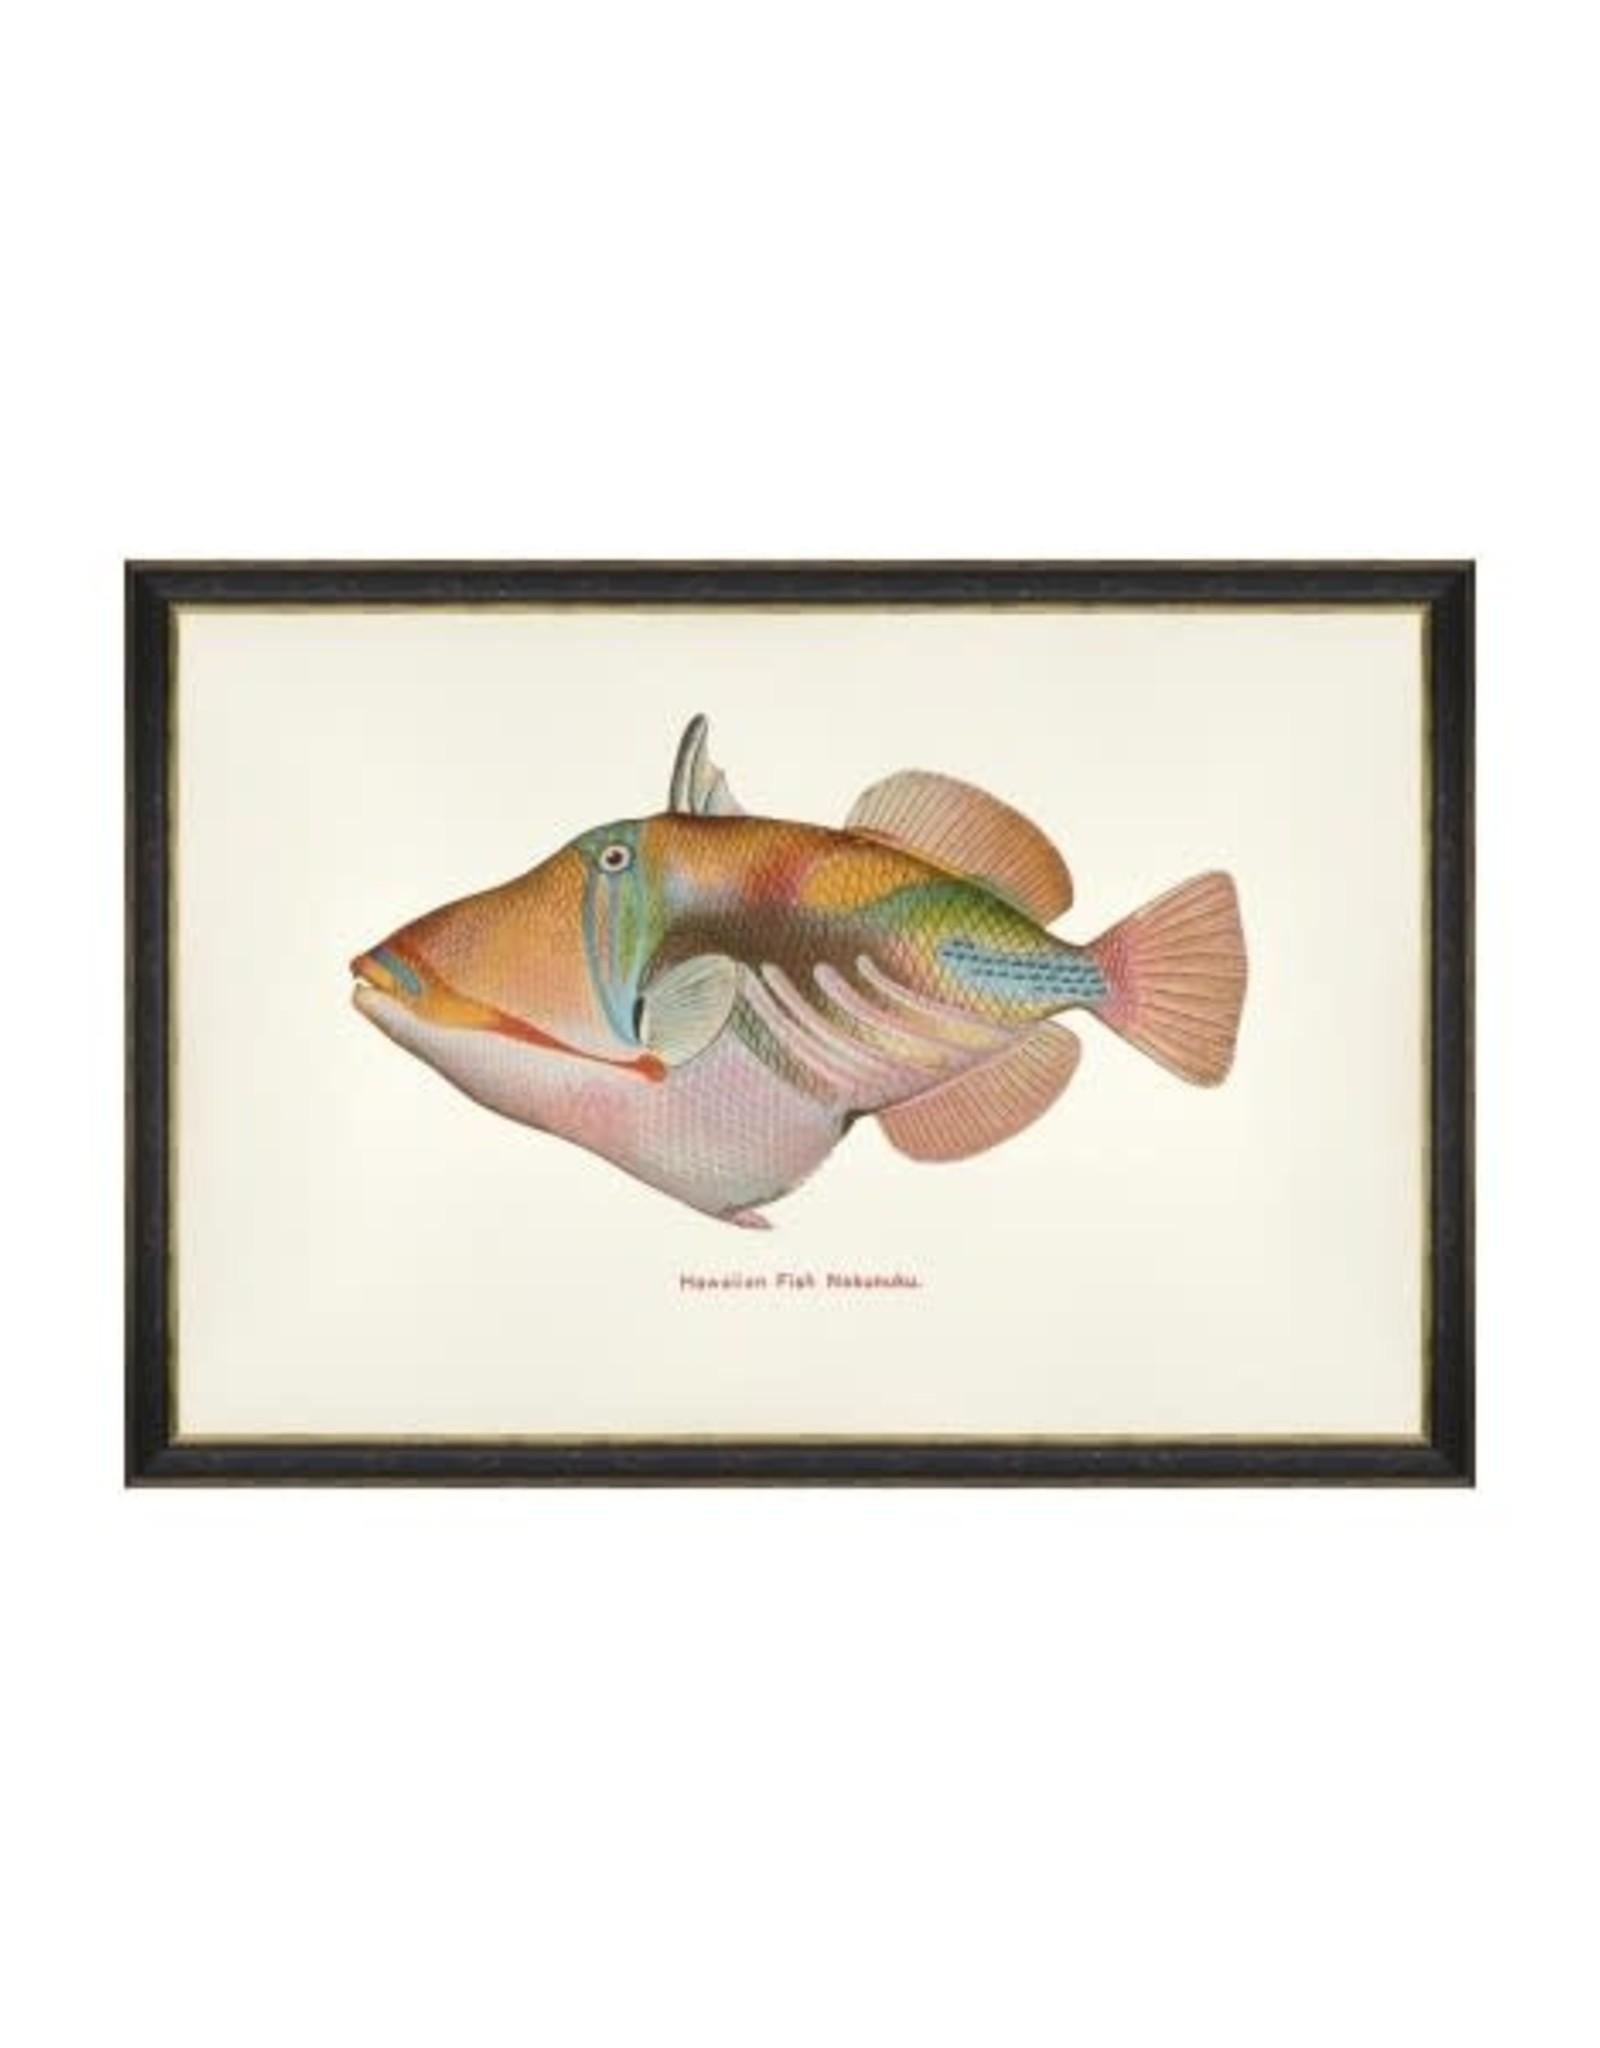 Mind the Gap Framed Art 60 x 40 cm - Fishes of hawaii - Nakunuku Fish